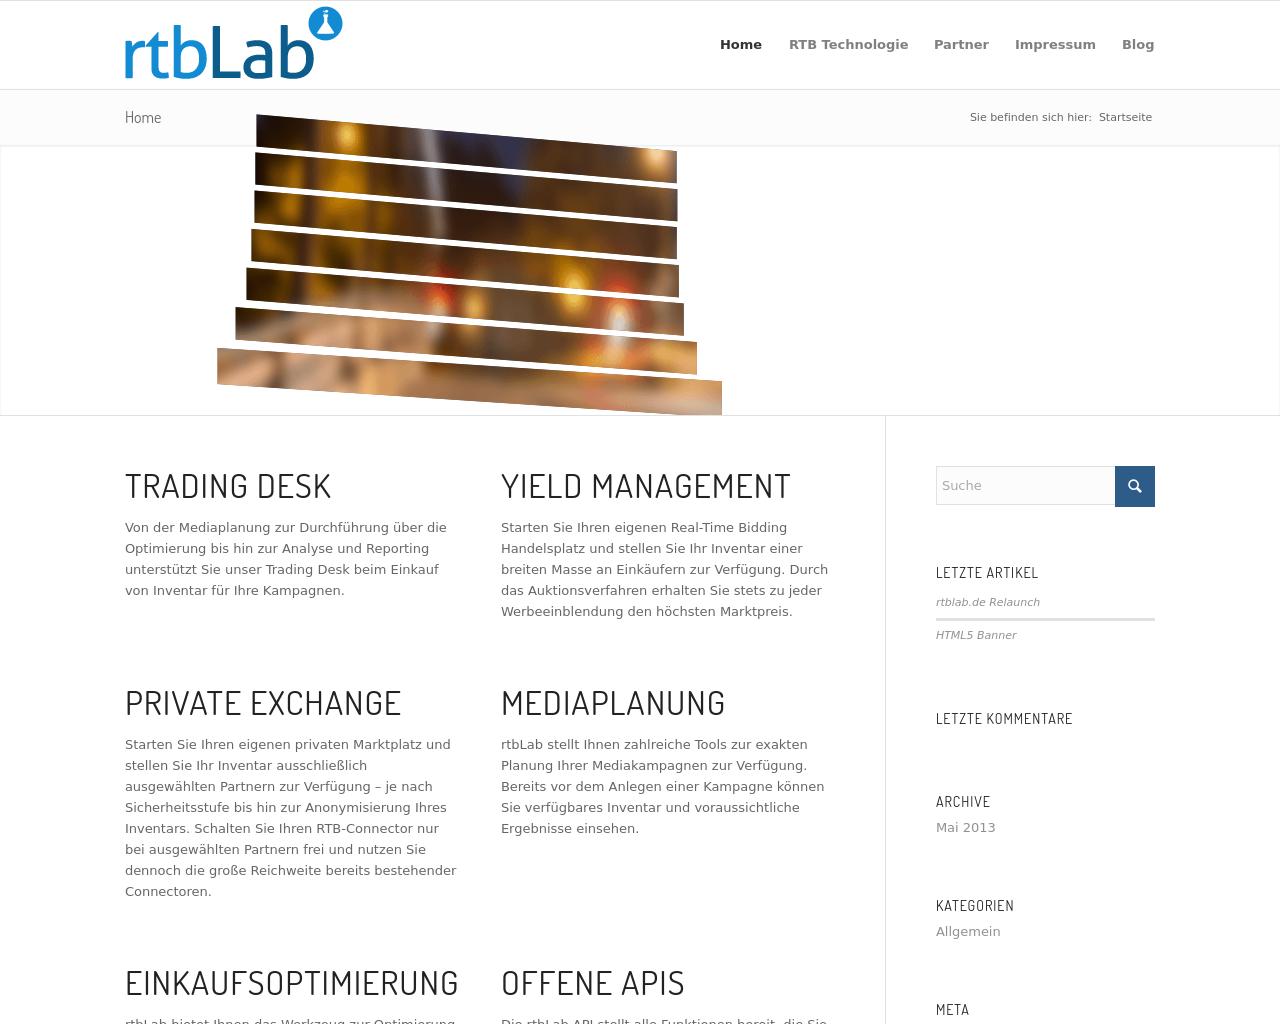 RTBlab-Advertising-Reviews-Pricing